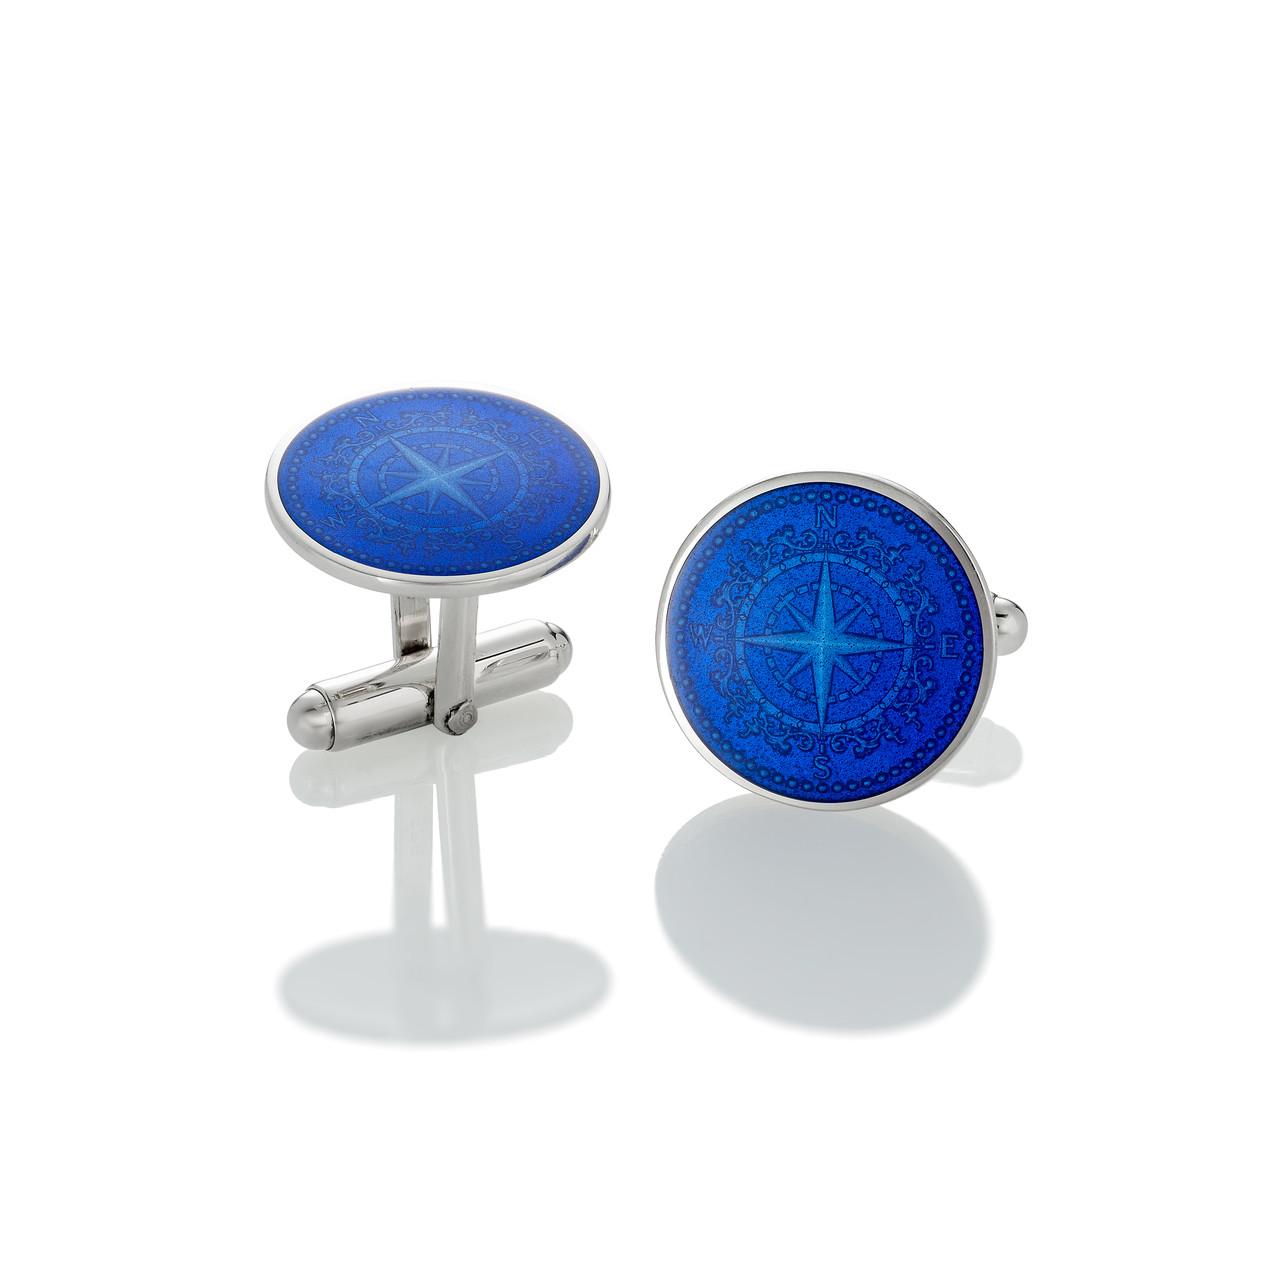 Colby Davis Compass Rose Cufflinks Royal Blue Www